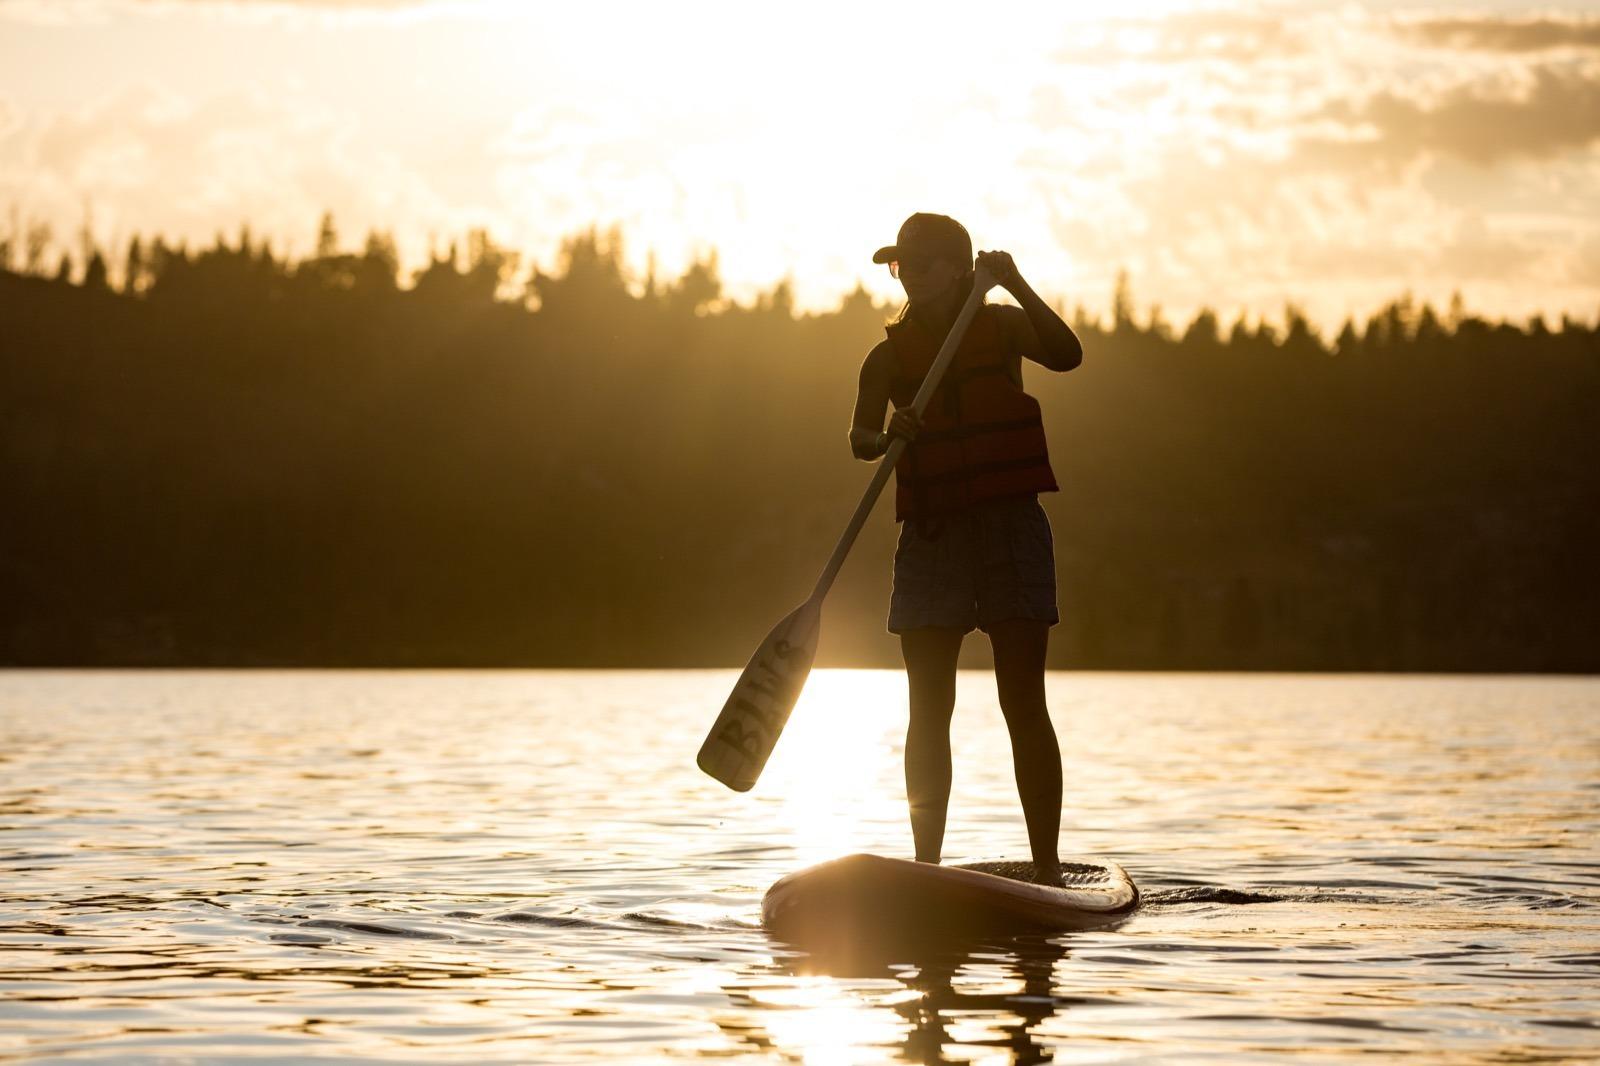 california-high-sierra-madera-bass-lake-stand-up-paddle-sup-sunset-4